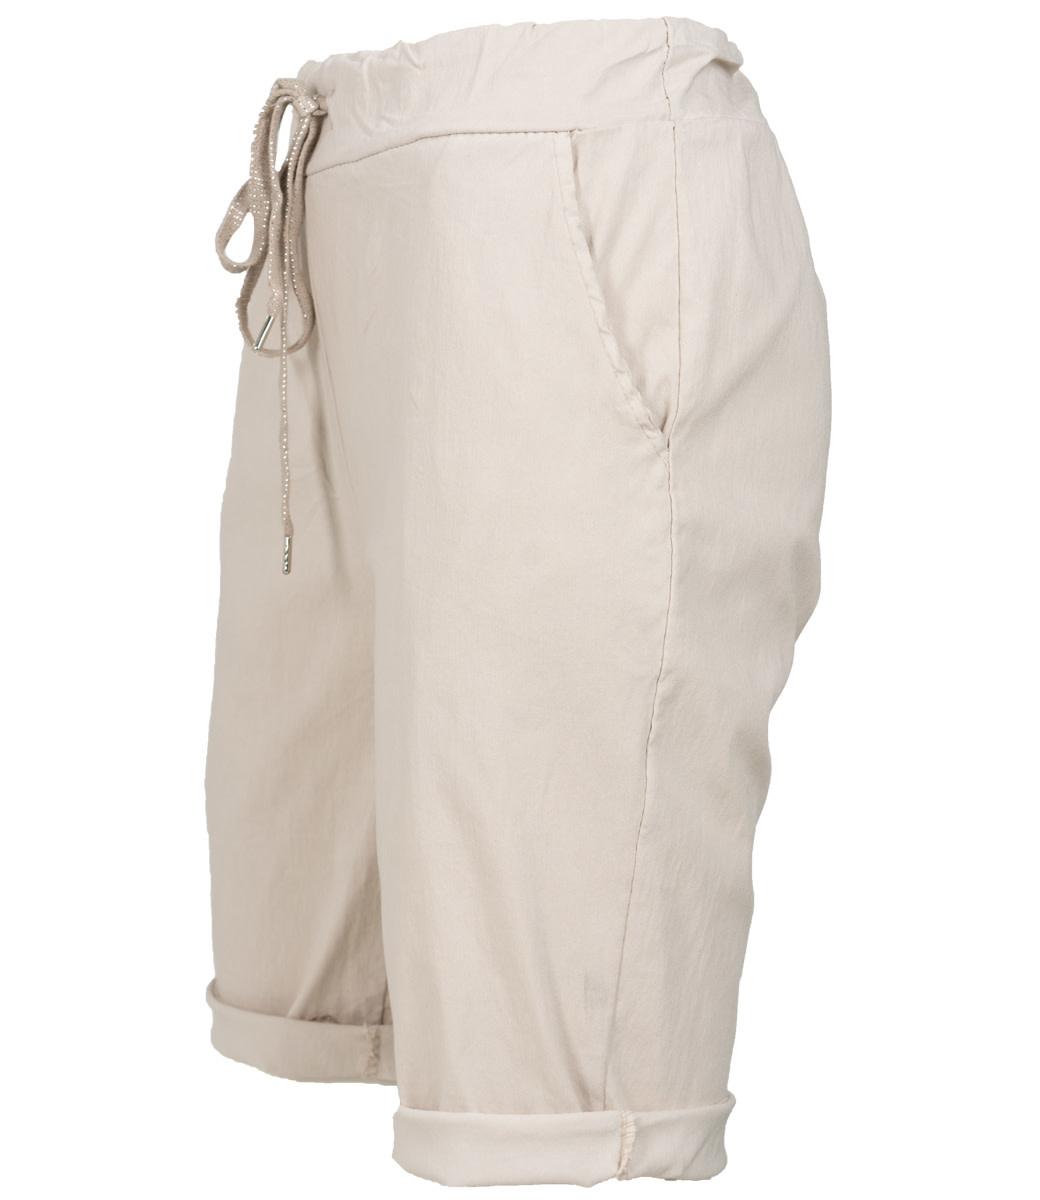 Wannahavesfashion Korte broek beige Cor